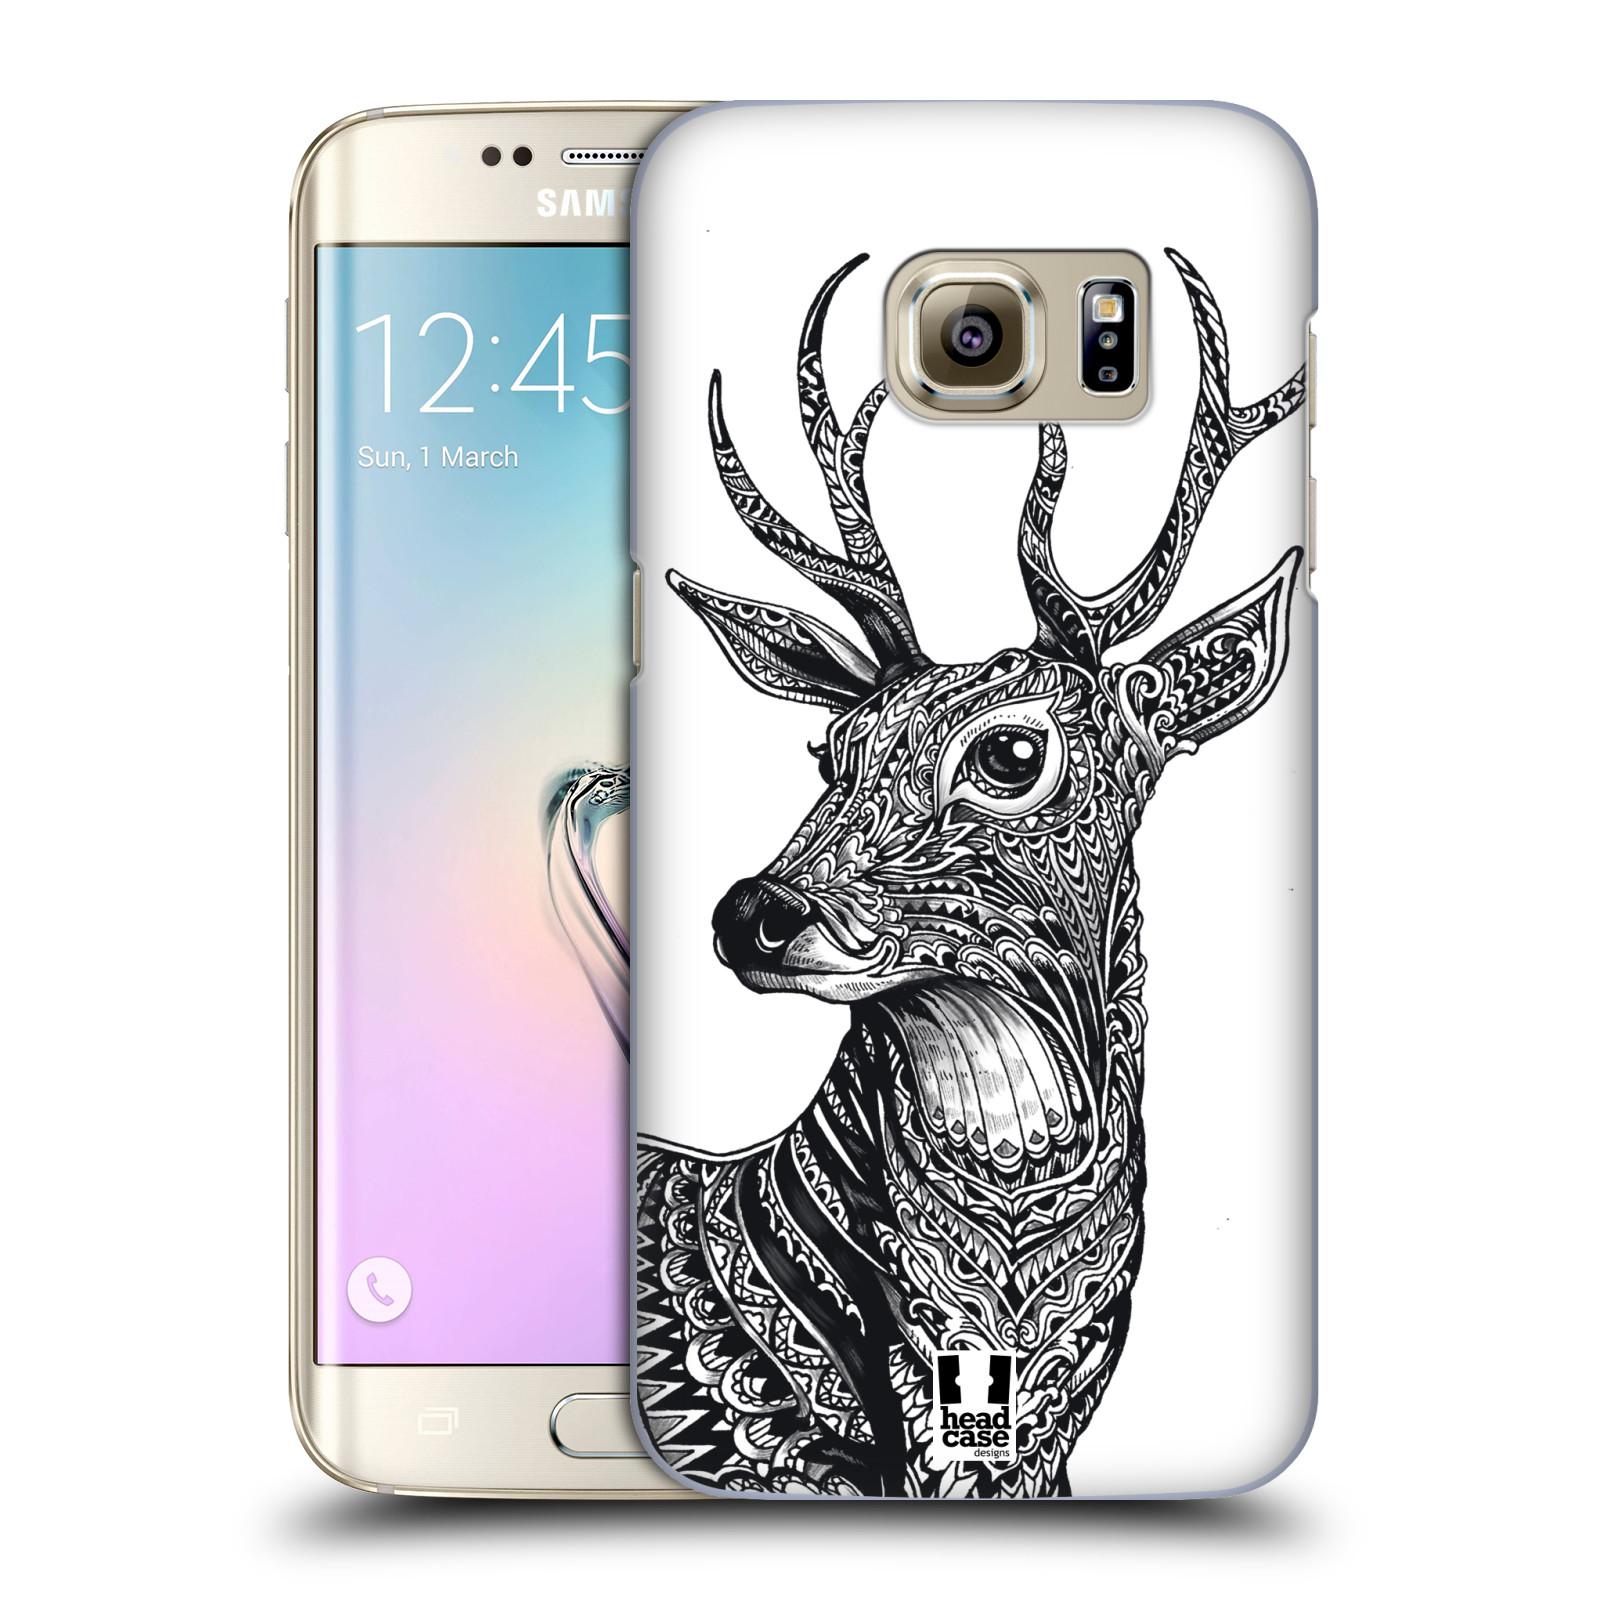 Plastové pouzdro na mobil Samsung Galaxy S7 Edge HEAD CASE Zdobený Jelínek (Plastový kryt či obal na mobilní telefon Samsung Galaxy S7 Edge SM-G935F)